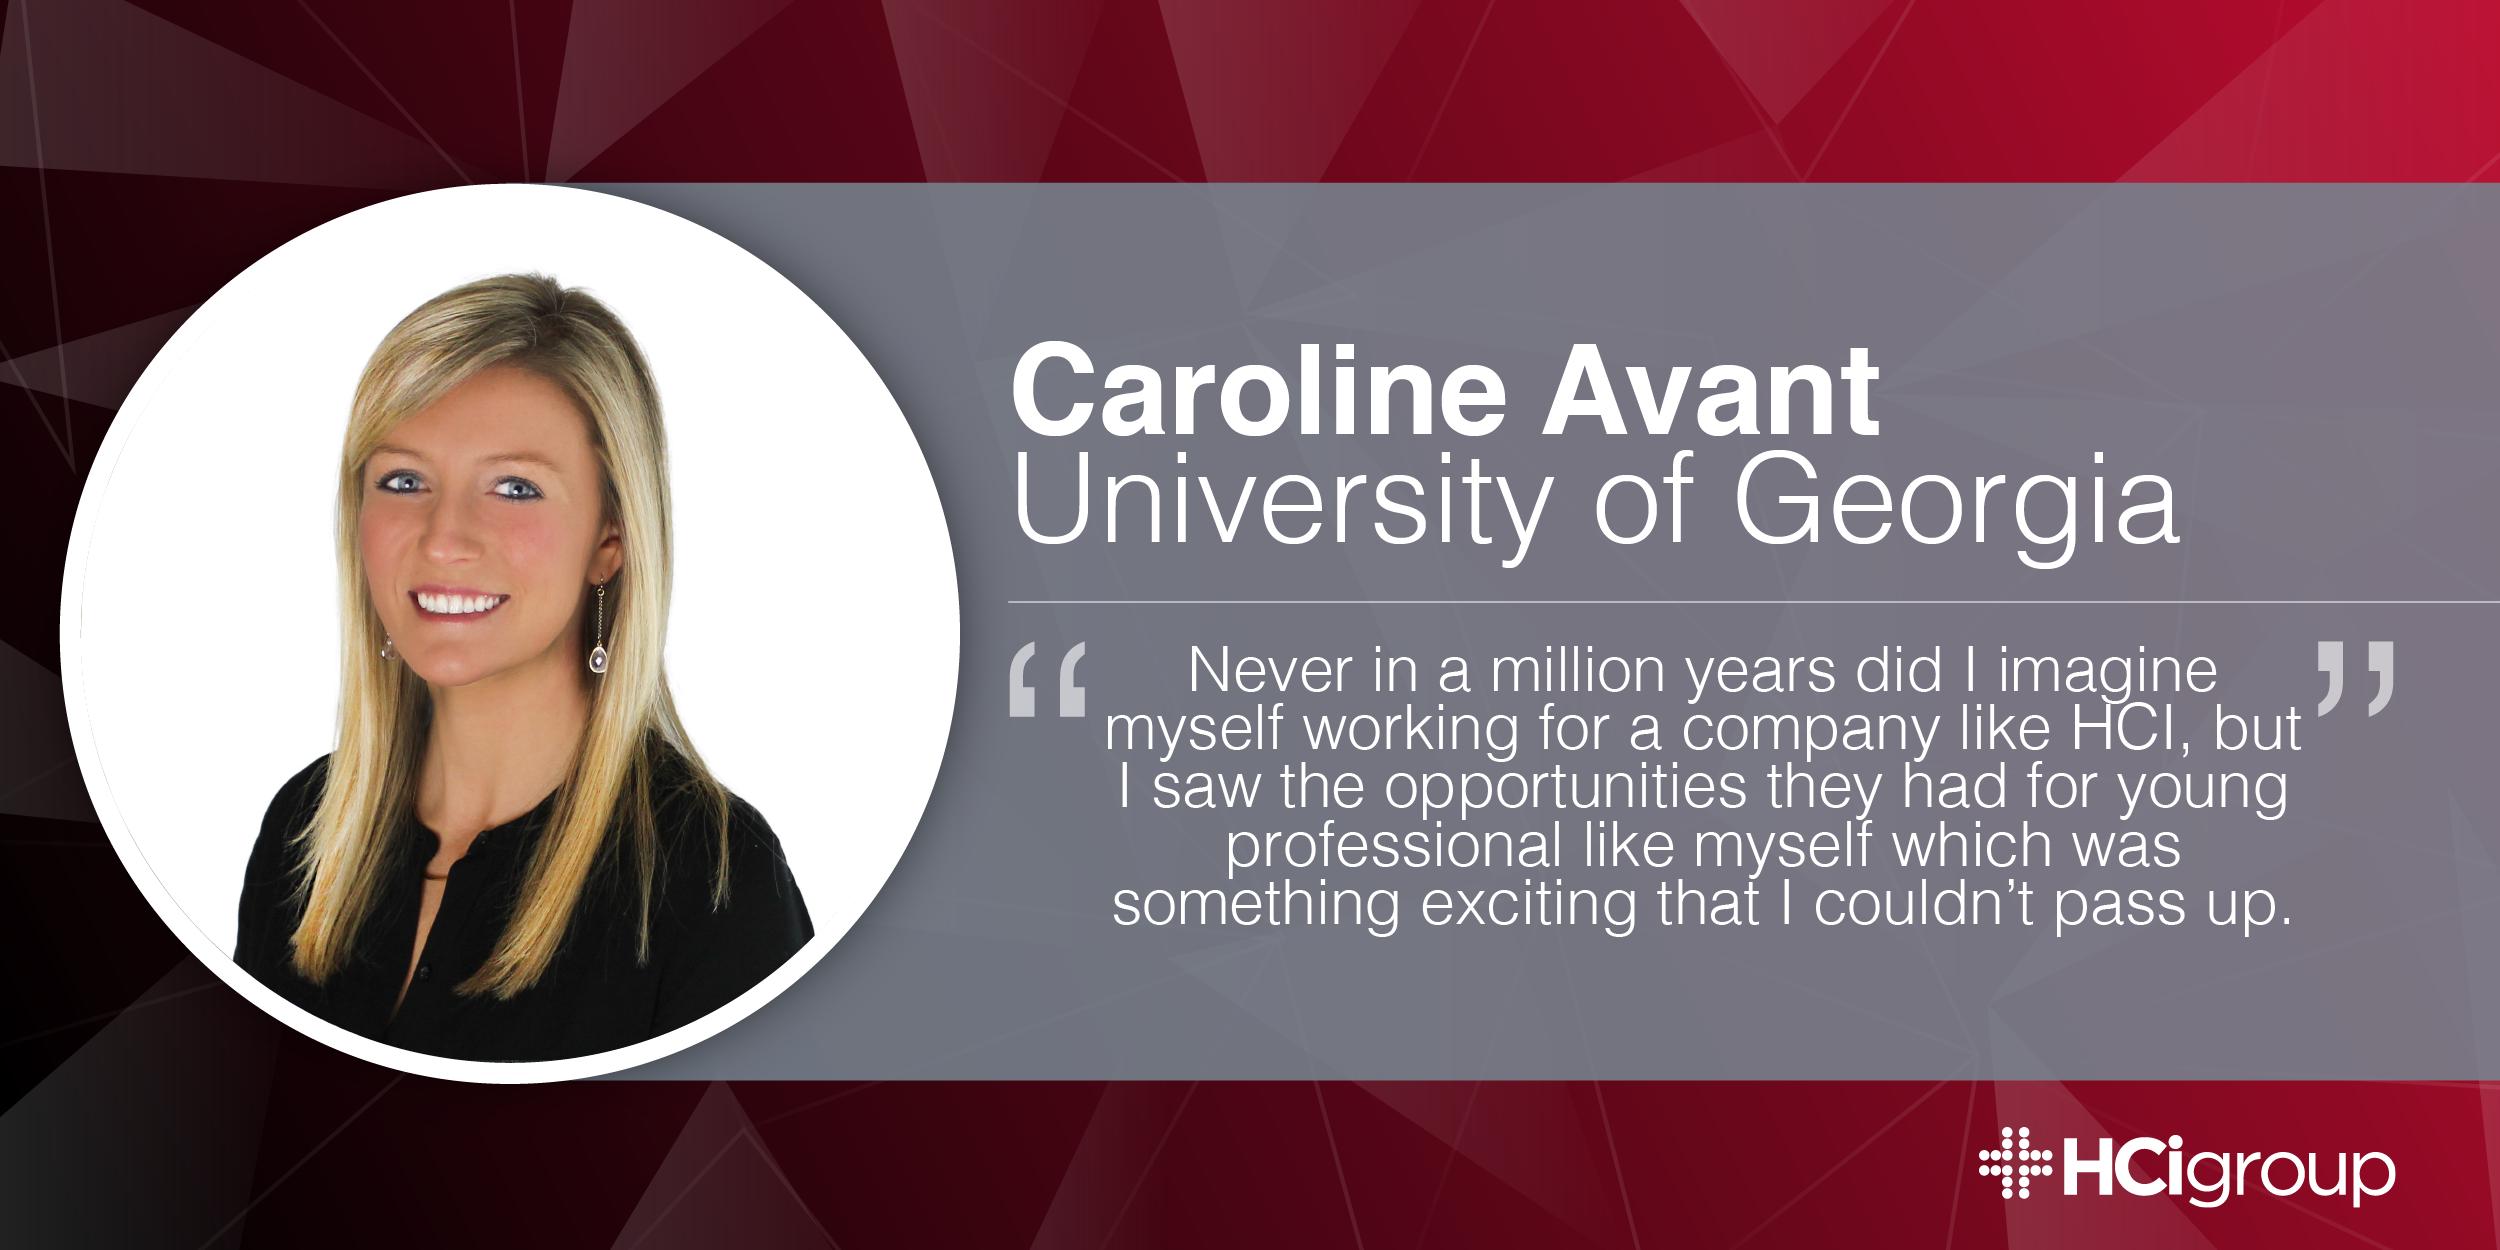 Caroline Avant